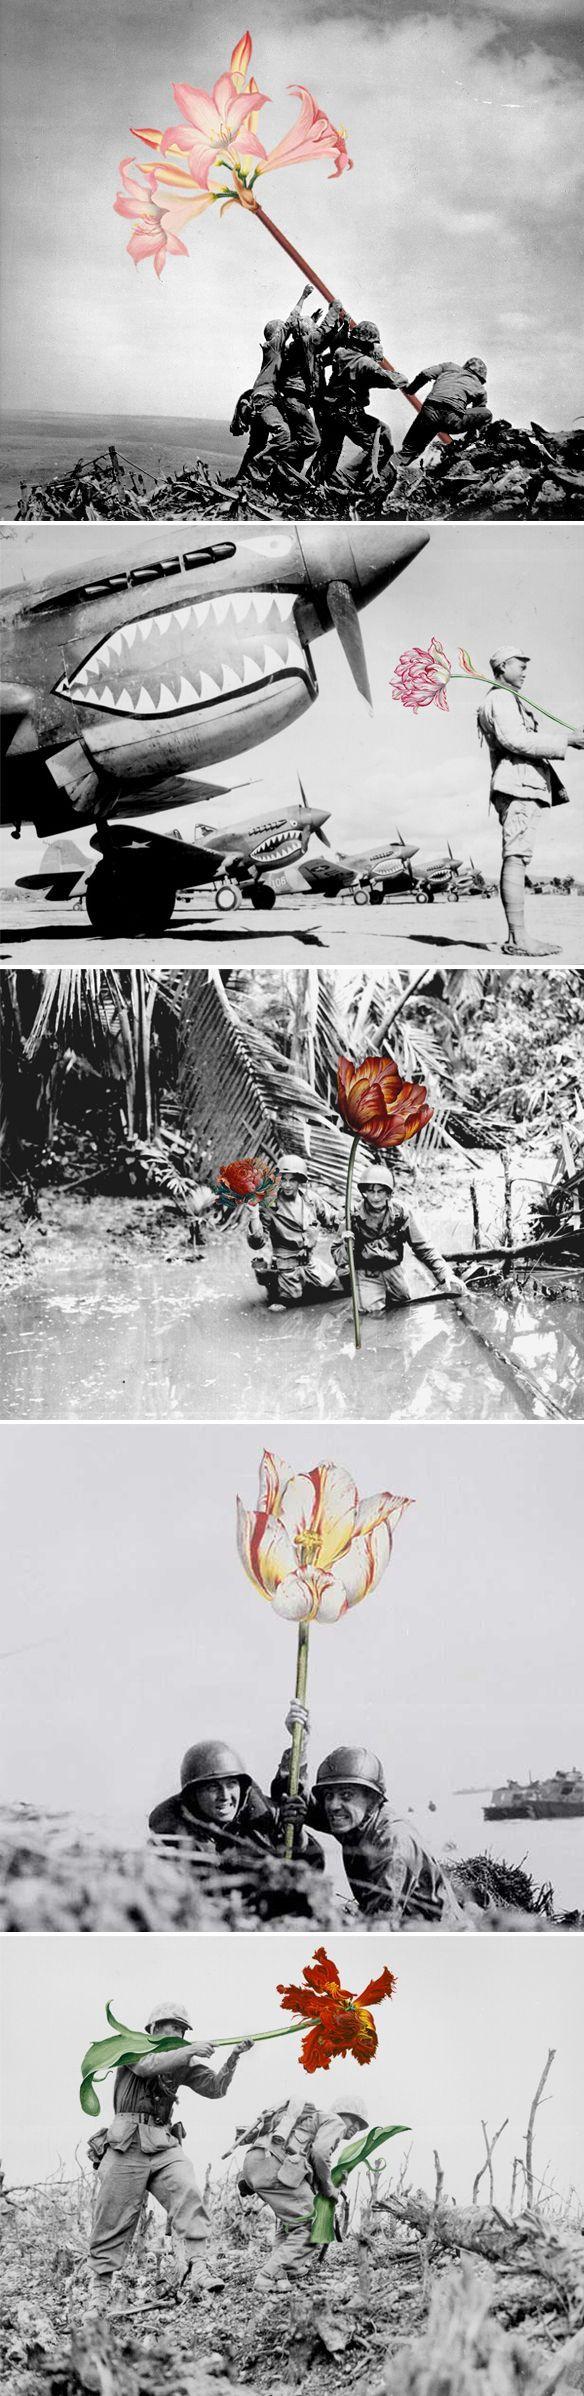 "Er stond bij ""flowers in place of guns. Thank you, mister Blick"" | Mister Blick, Flowers, not guns"